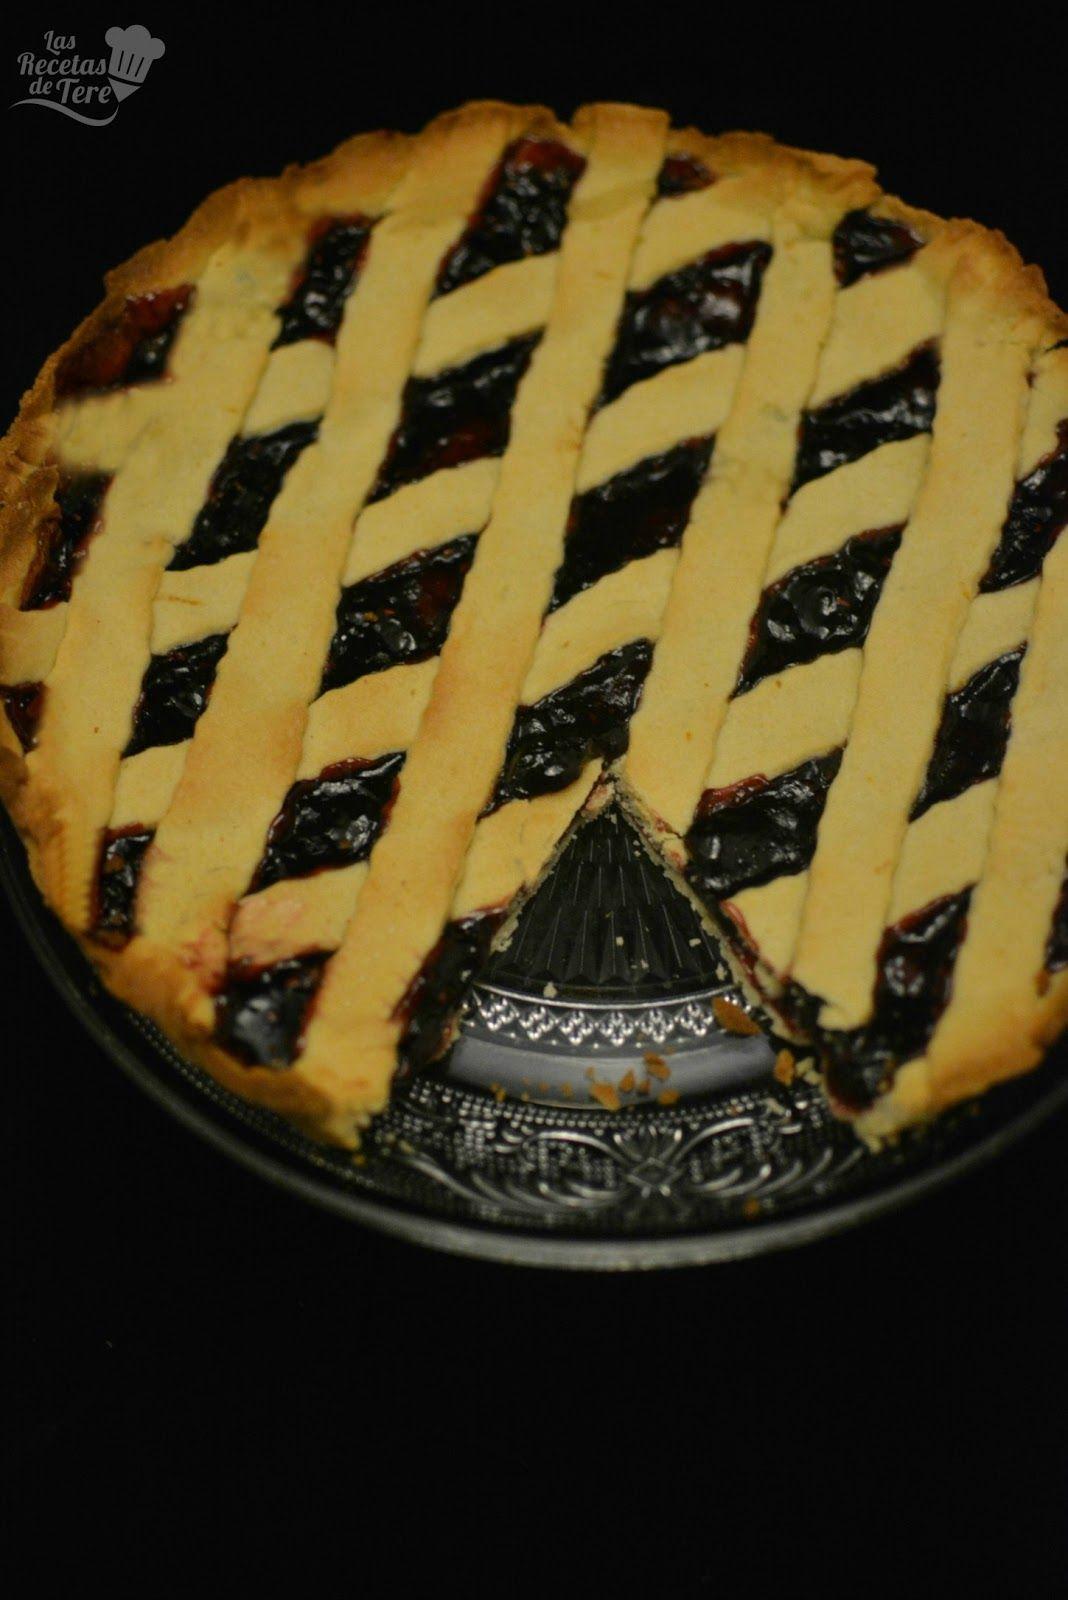 crostata de mermelada tererecetas las recetas de tere 02